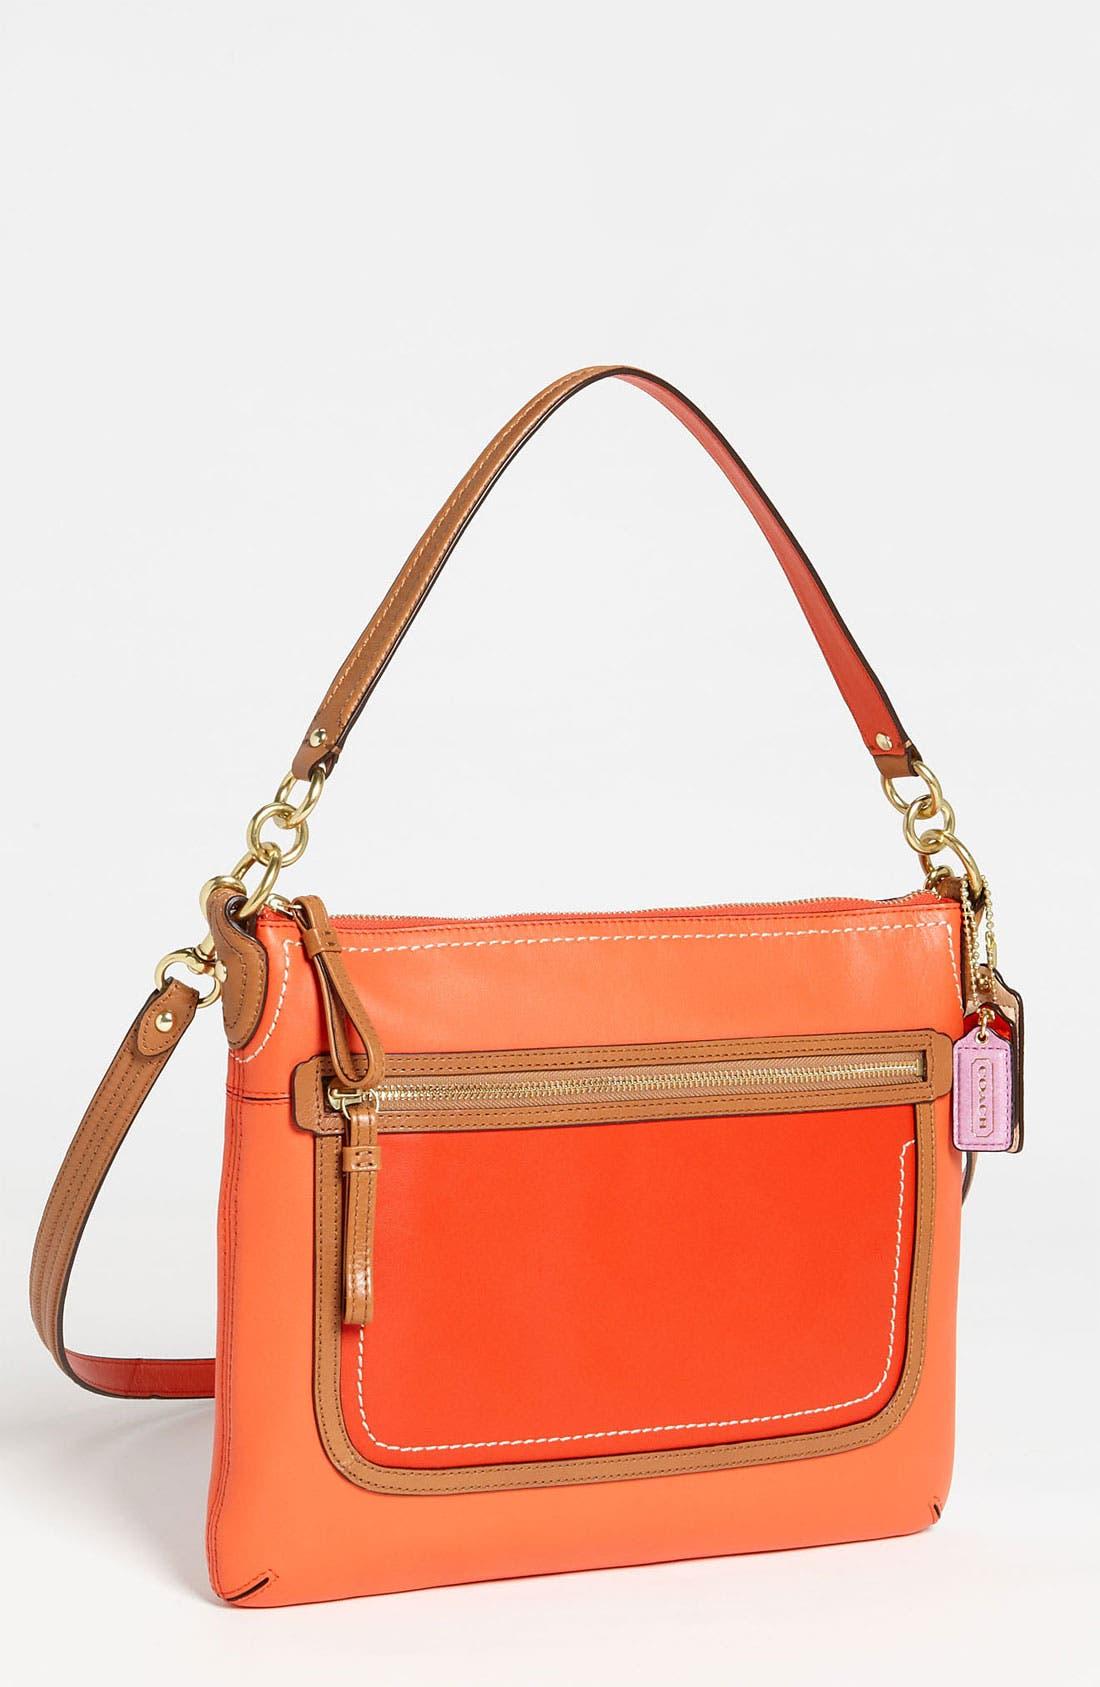 Main Image - COACH 'Poppy Colorblock' Shoulder Bag